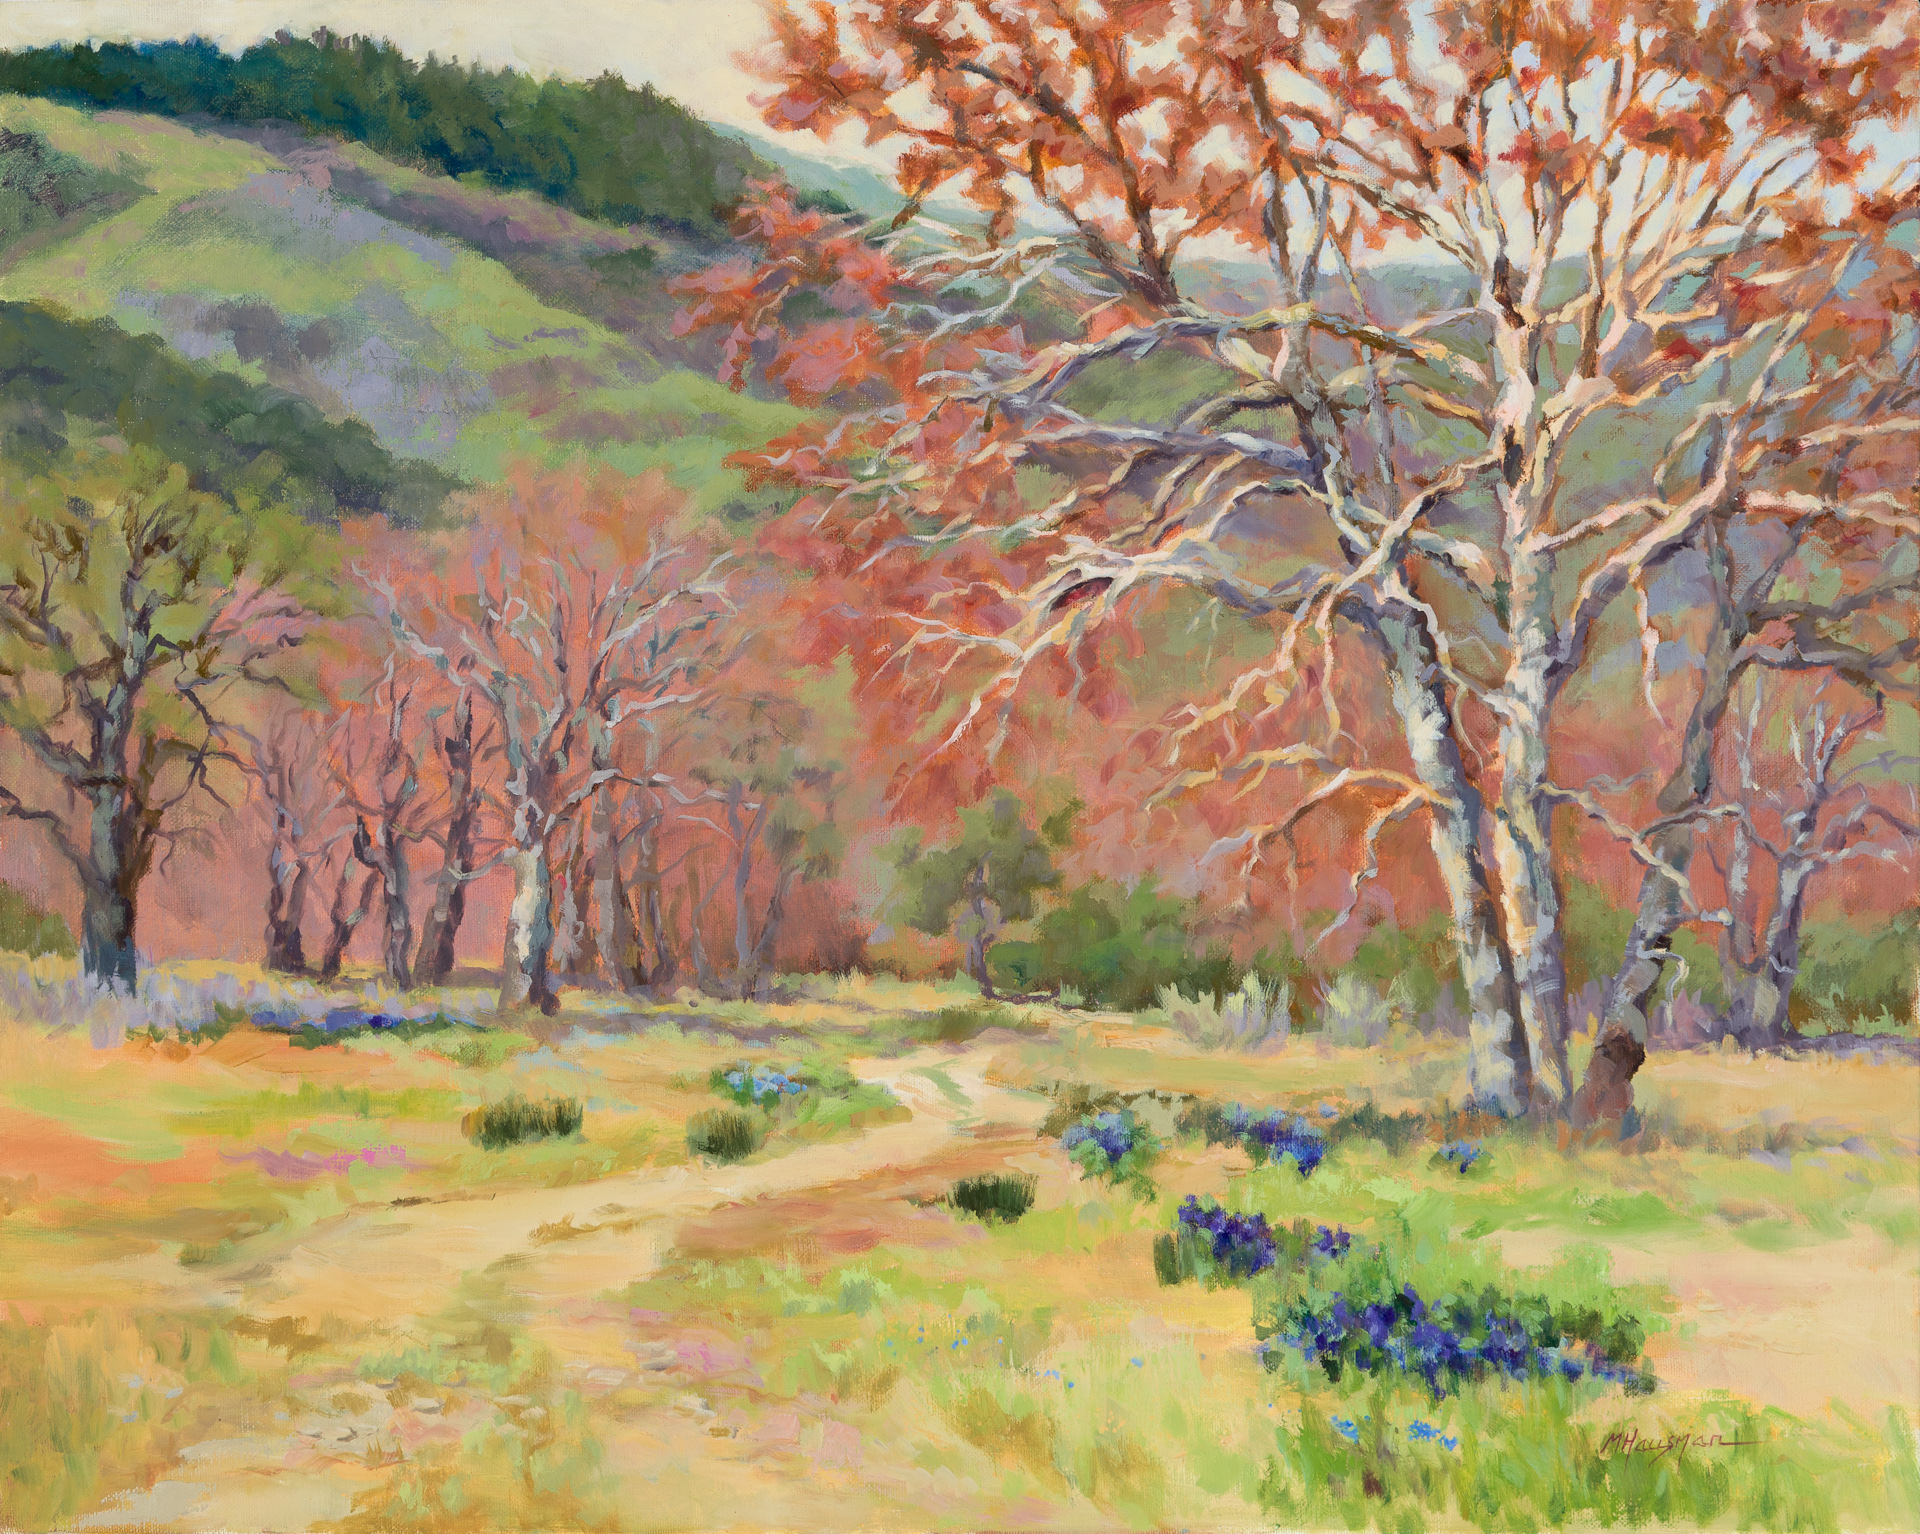 Breath of Spring, oil, 24x30